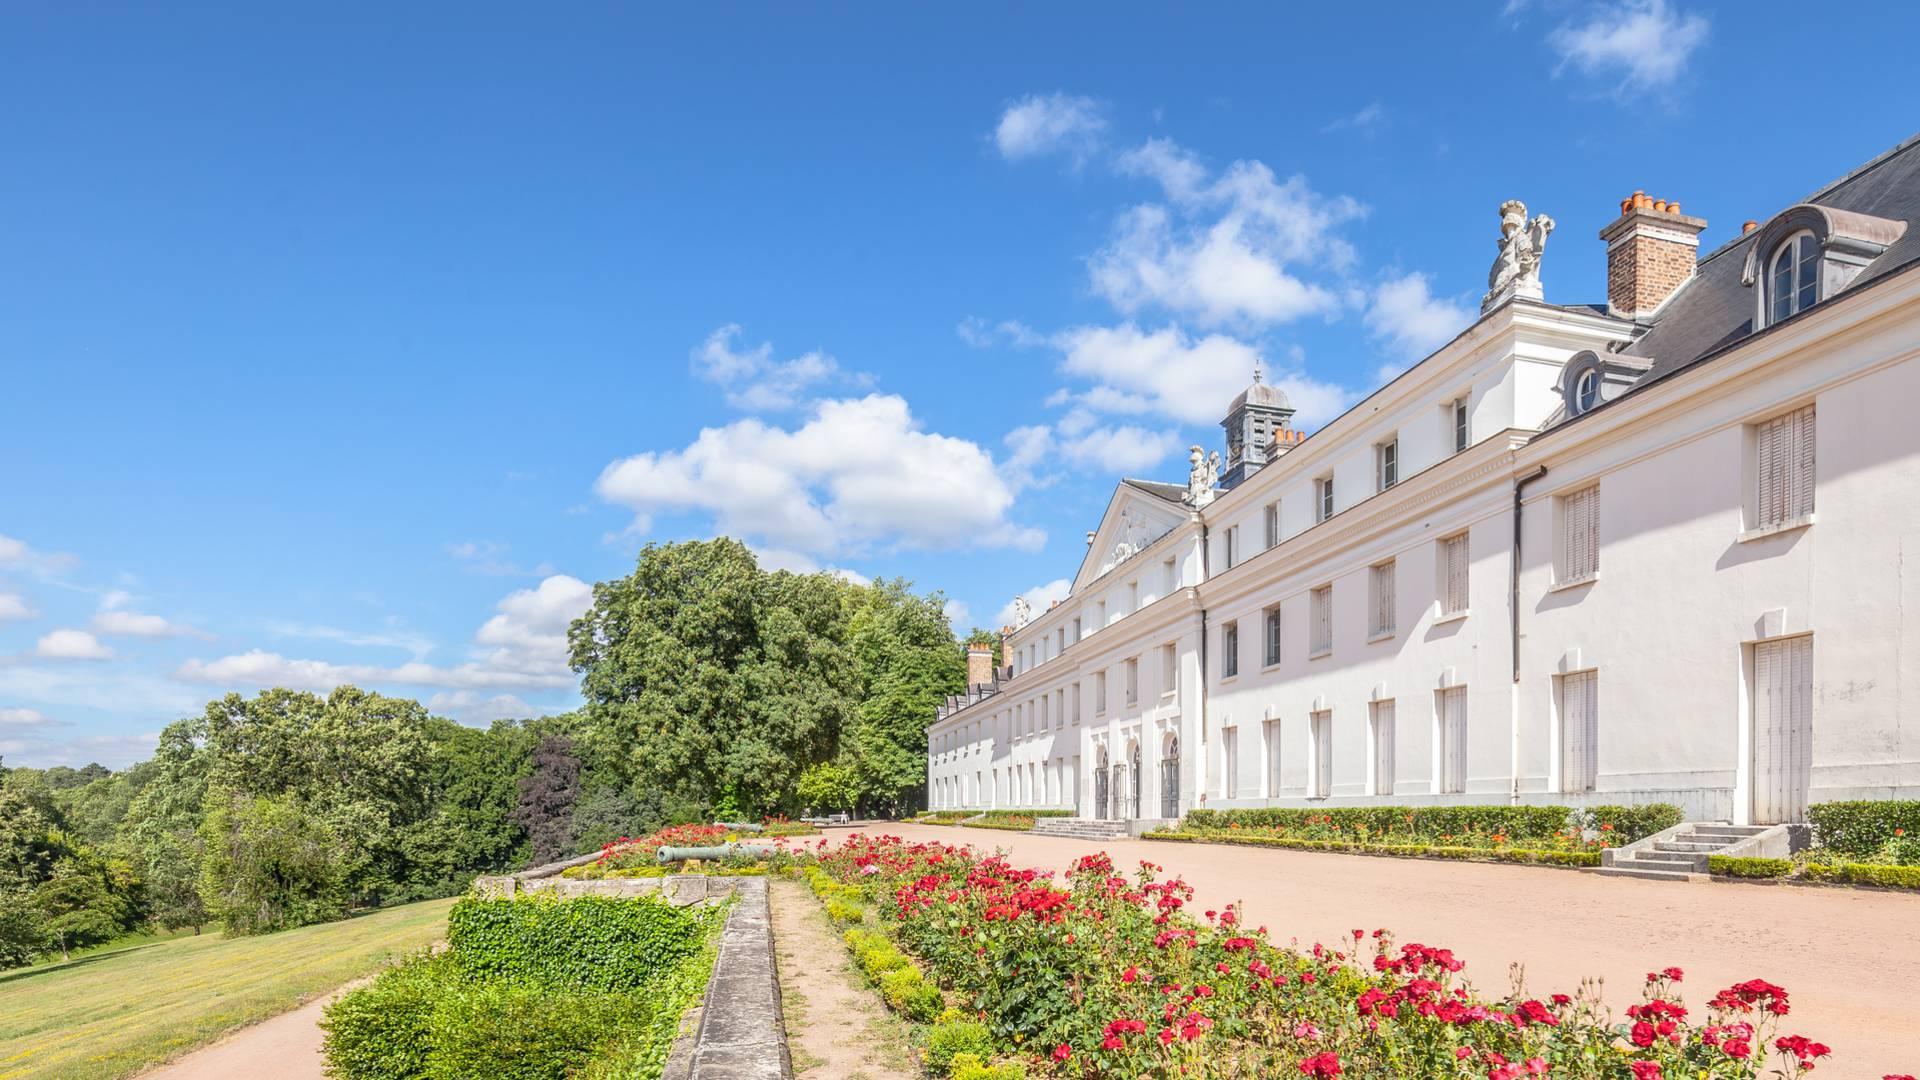 Façade et terrasse du château de la Verrerie, Le Creusot. © Xavier Spertini.